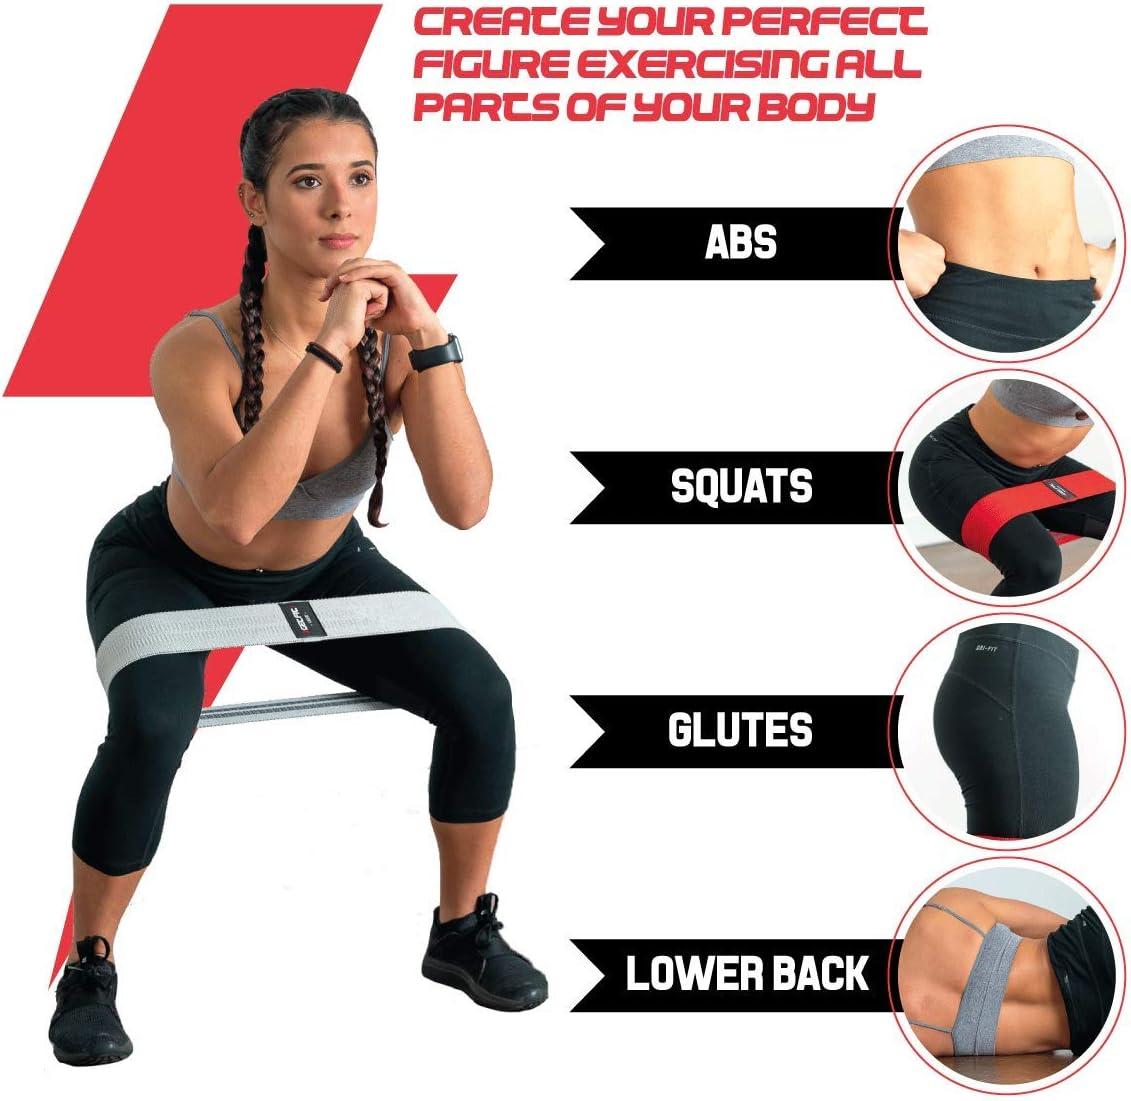 2GetFit Bandas Elásticas Musculación (Set de3): Banda Tela Glúteos, Goma de Resistencia Fitness, Cintas/Bandas Elásticas/Resistencia, Gimnasio/Gym/TRX